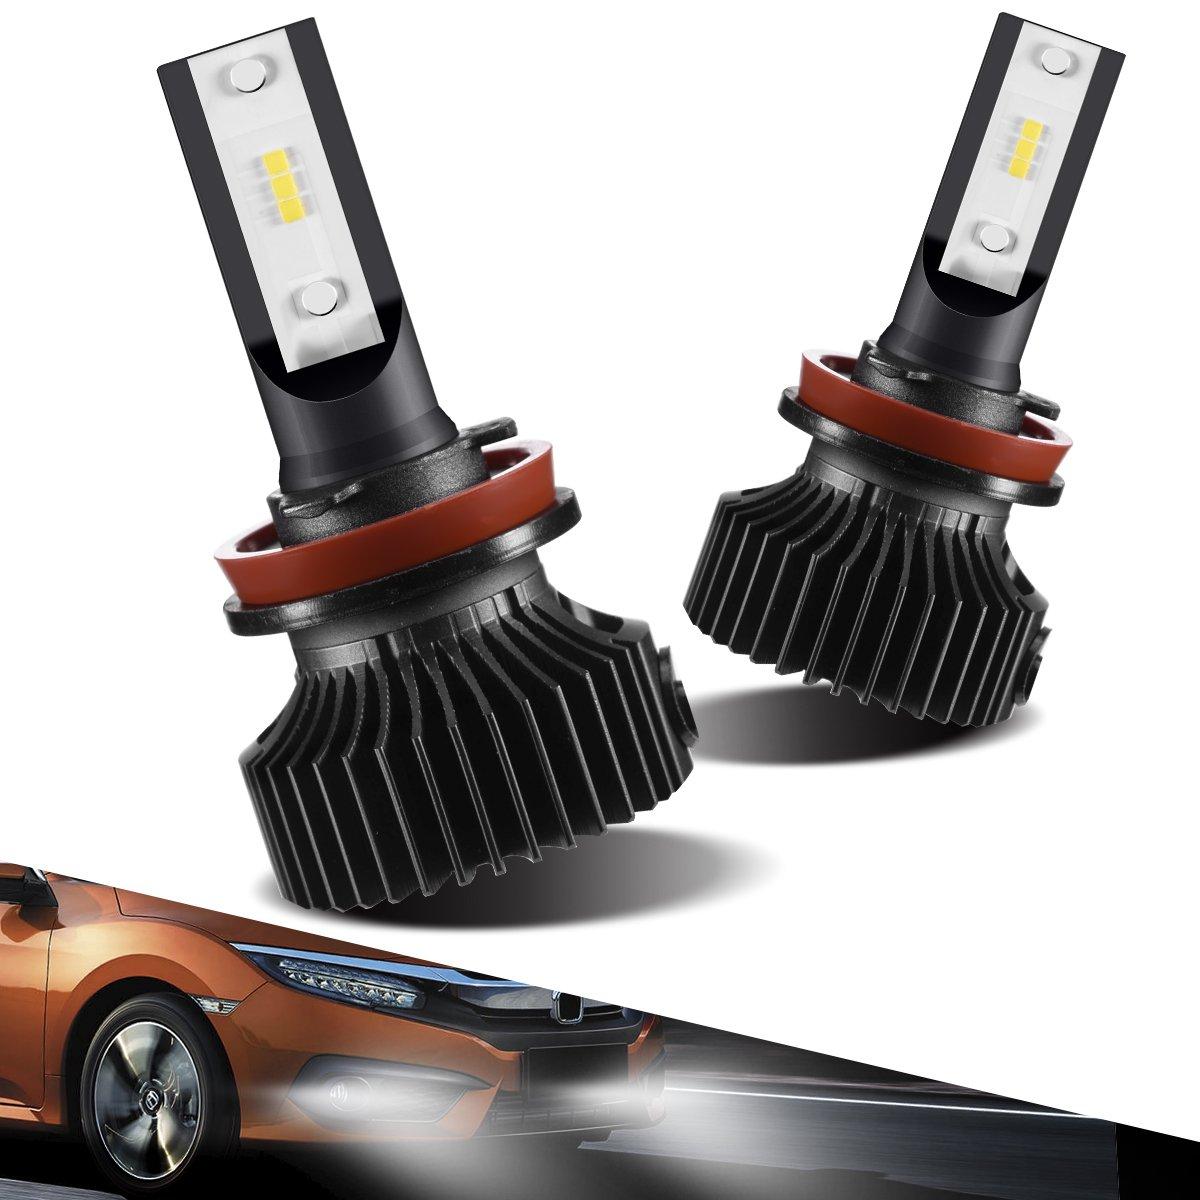 H11/H8/H9/H16 LED Fog Light Bulbs Conversion Kit, Marsauto Super Bright Fog Lamp Halogen Replacement, Xenon White 6000K (2-Pack)